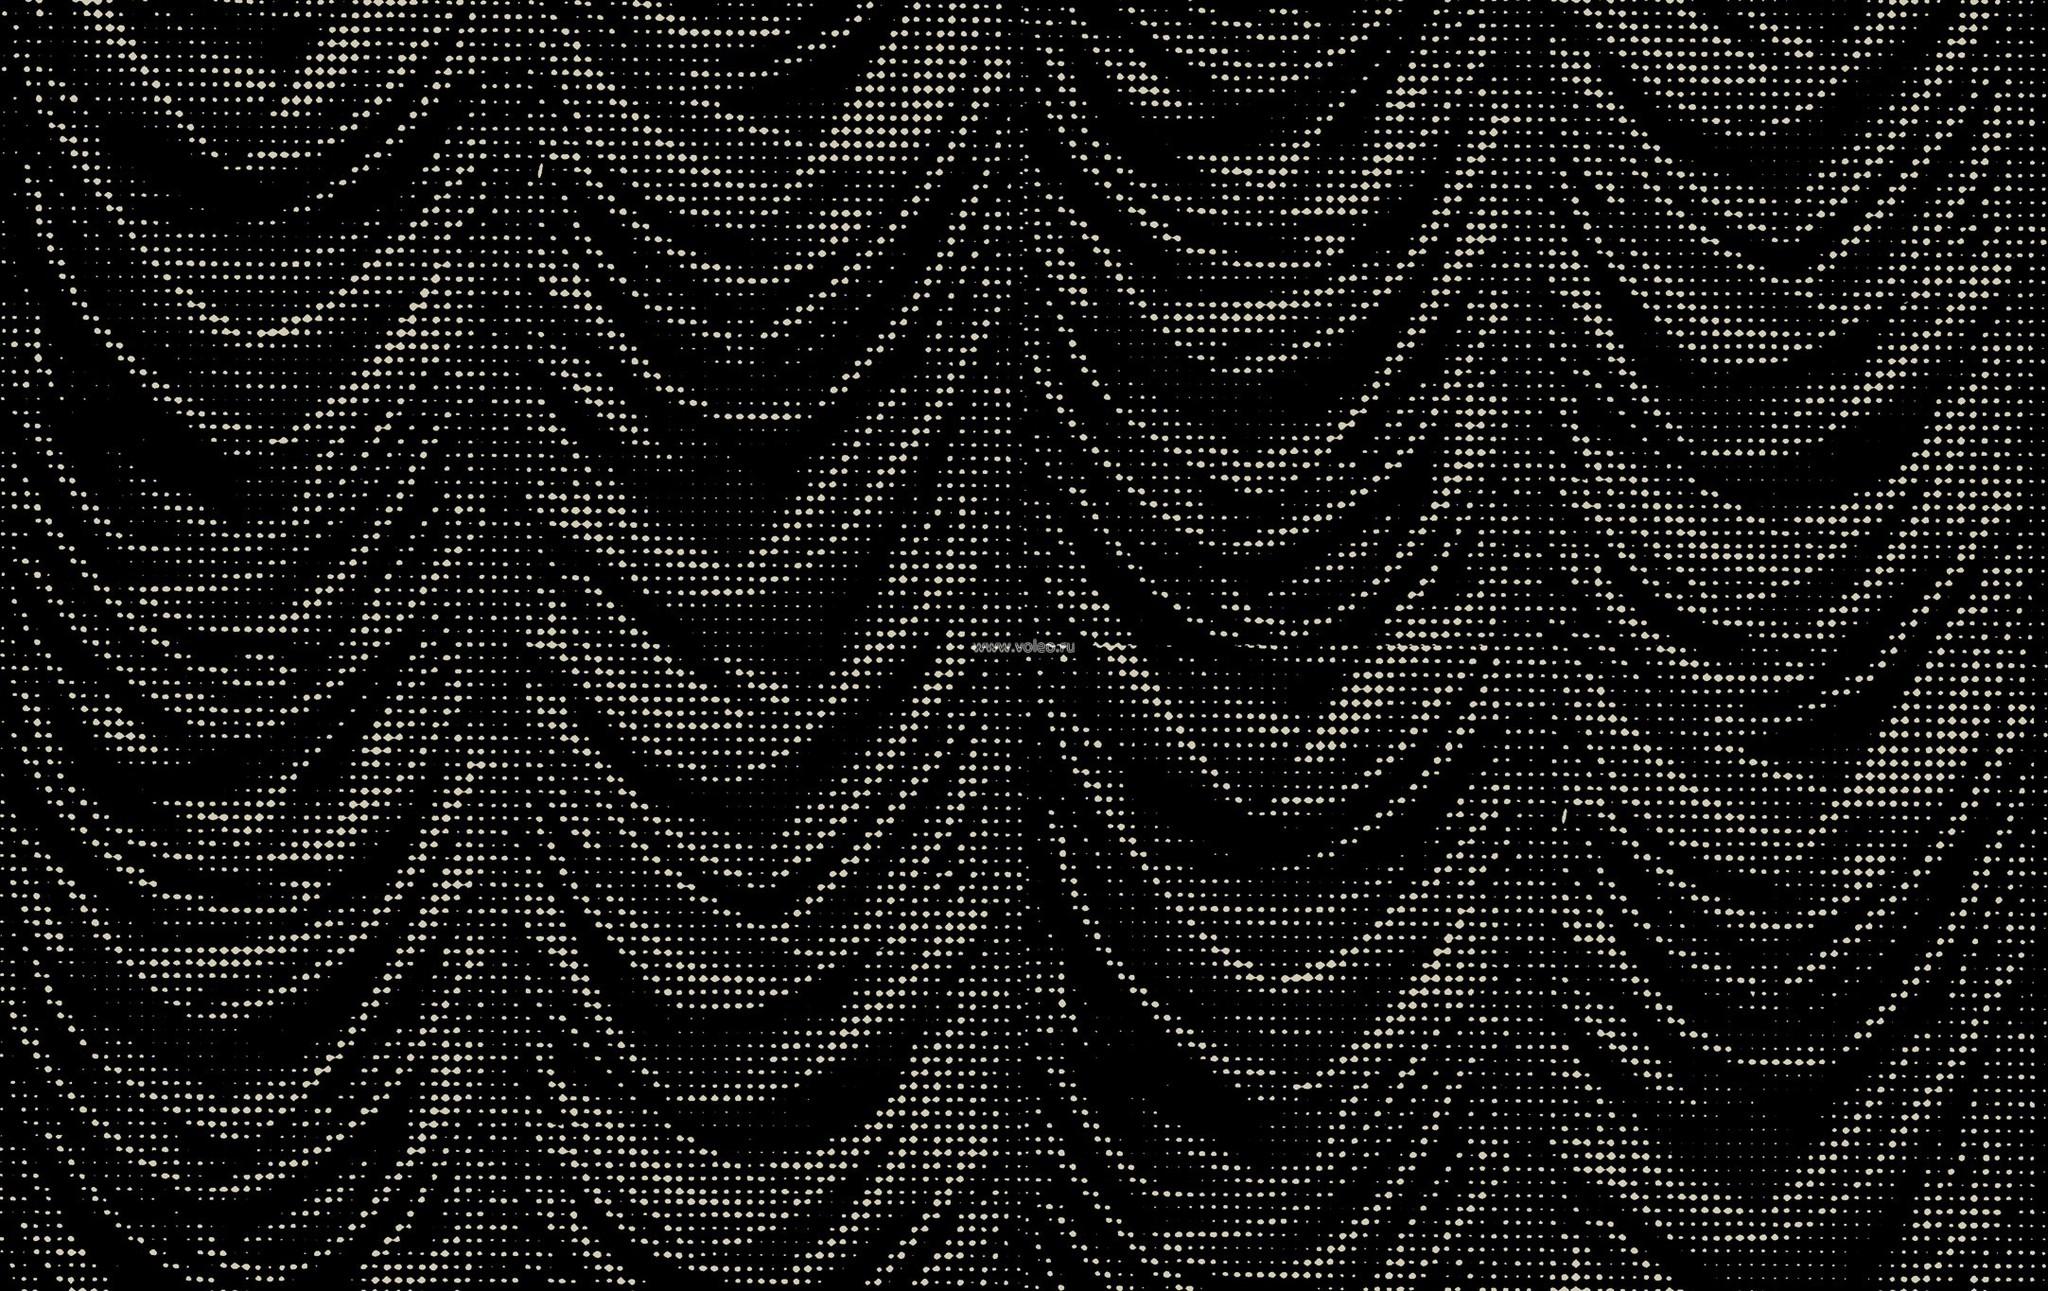 Обои Cole & Son Geometric 93/7024, интернет магазин Волео